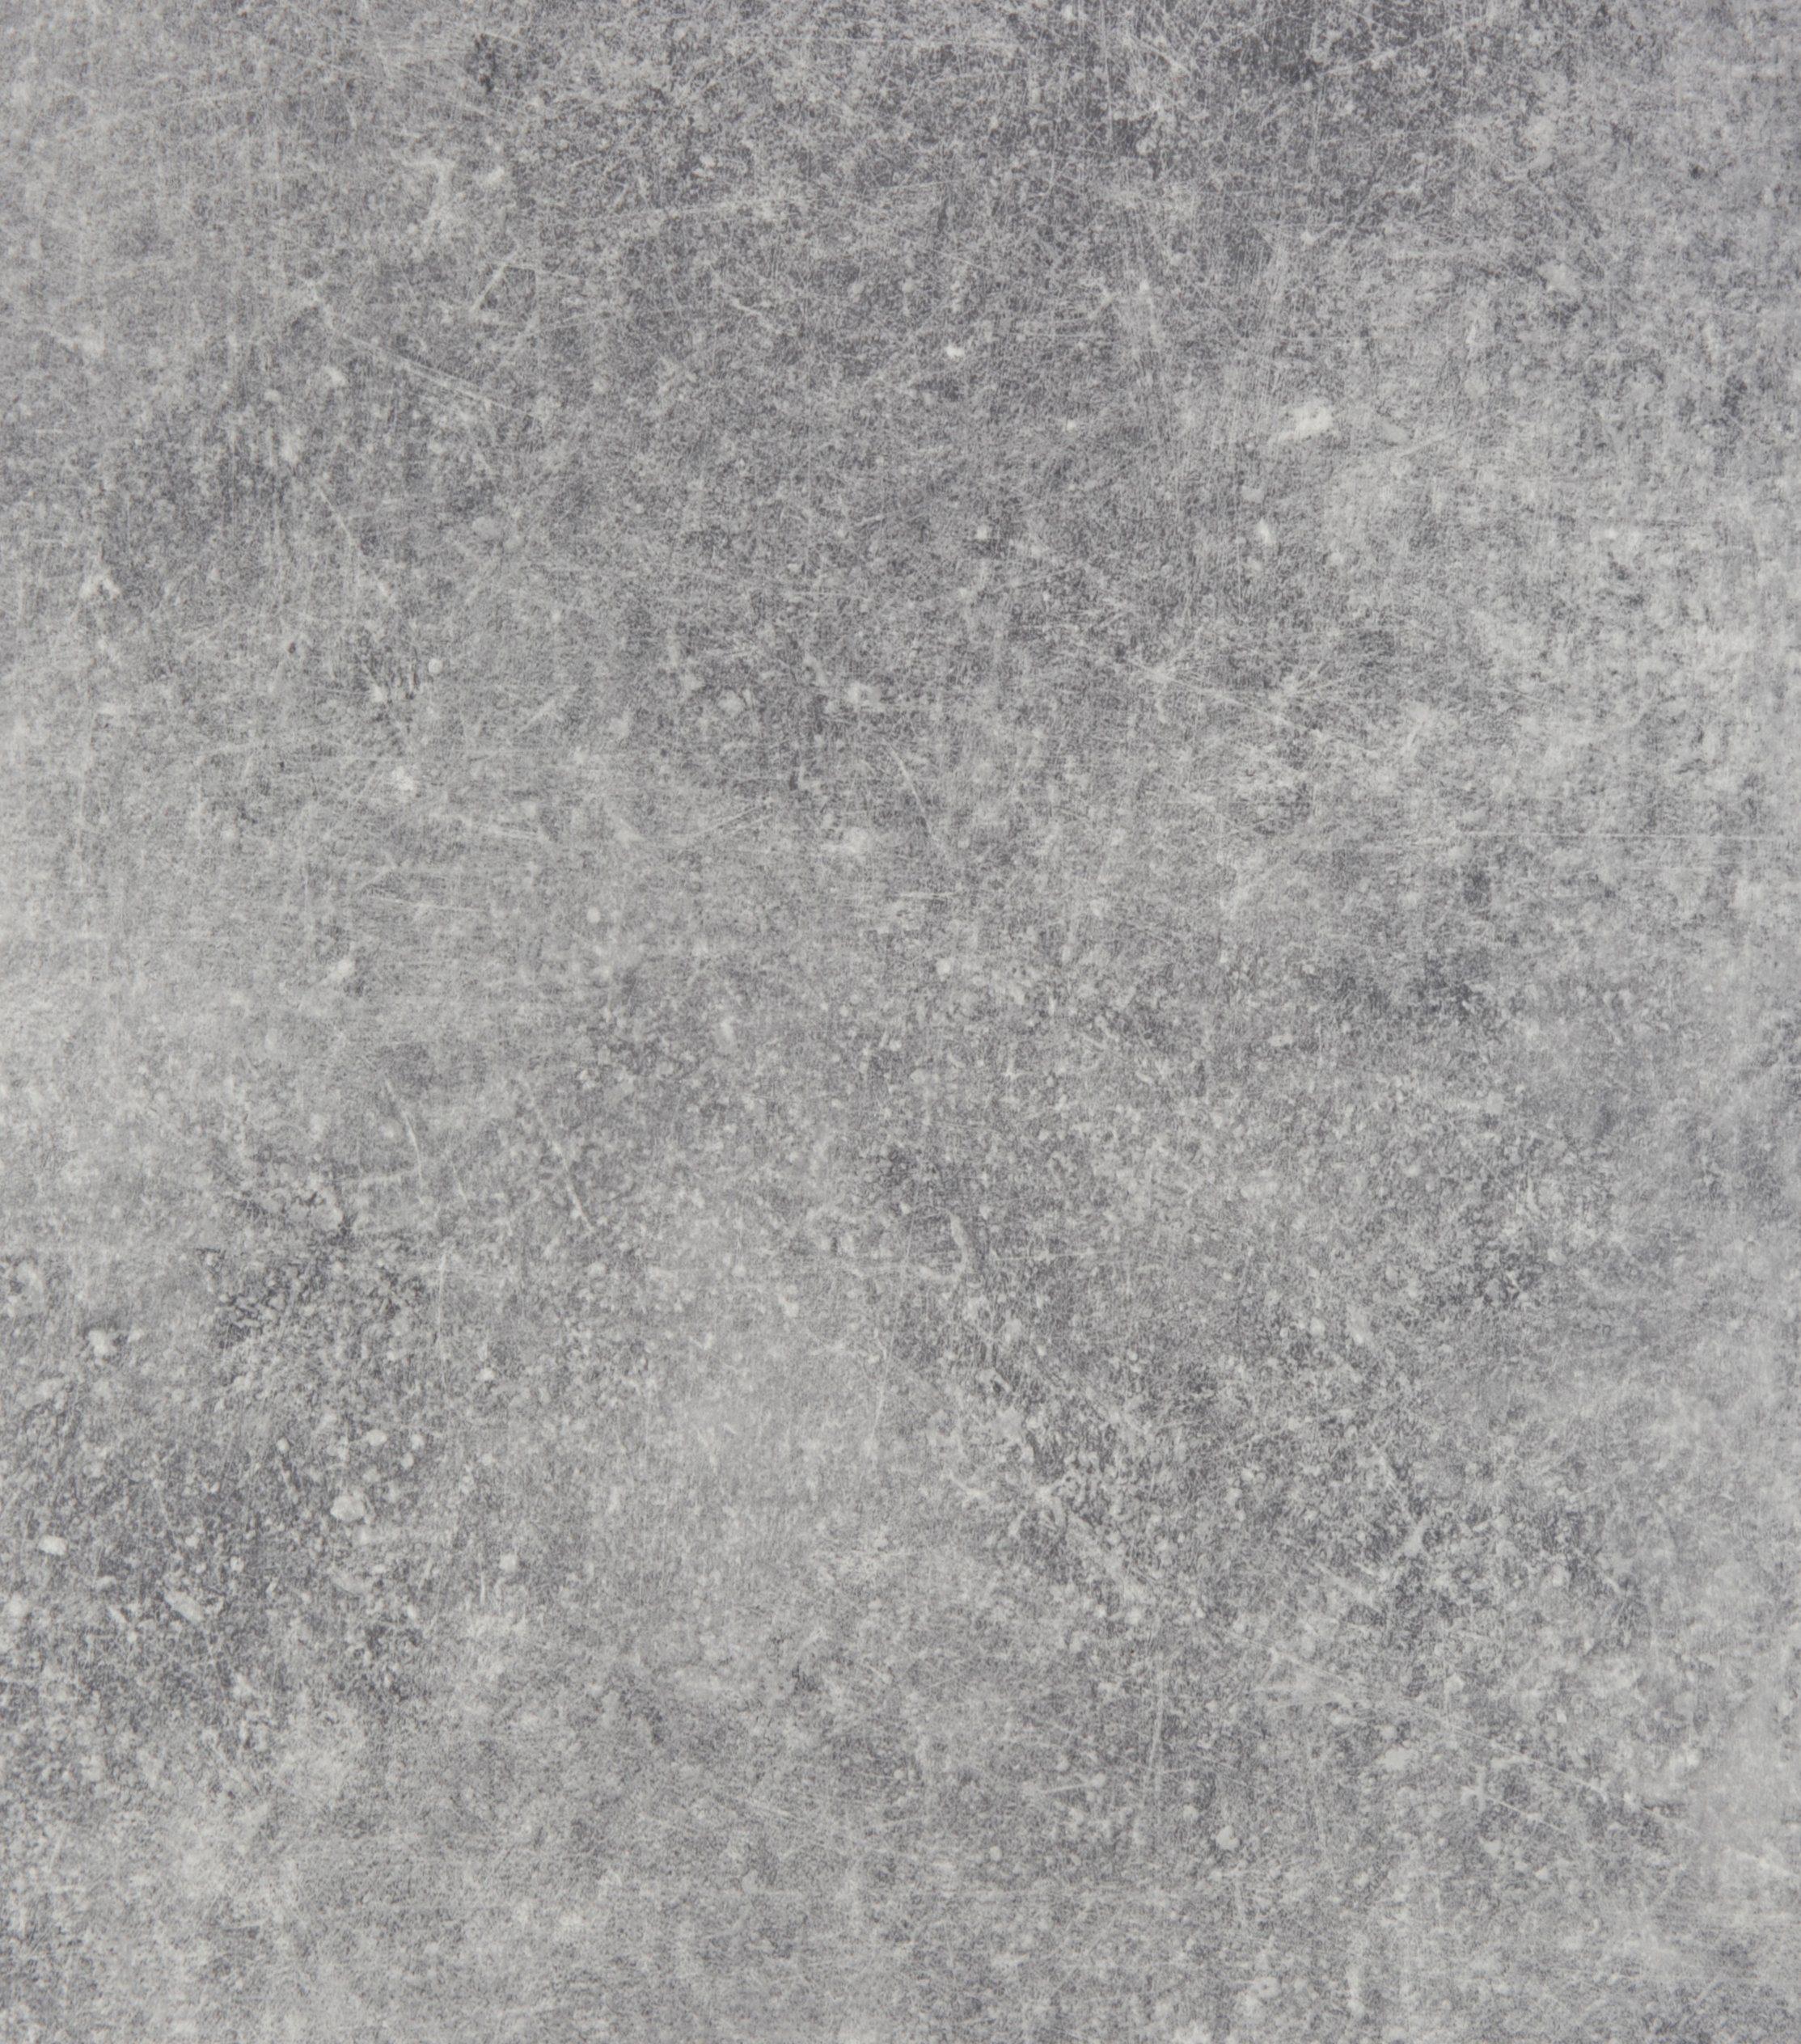 ANDIAMO Vinyl-Boden »Crash«, Breite 400 cm, grau